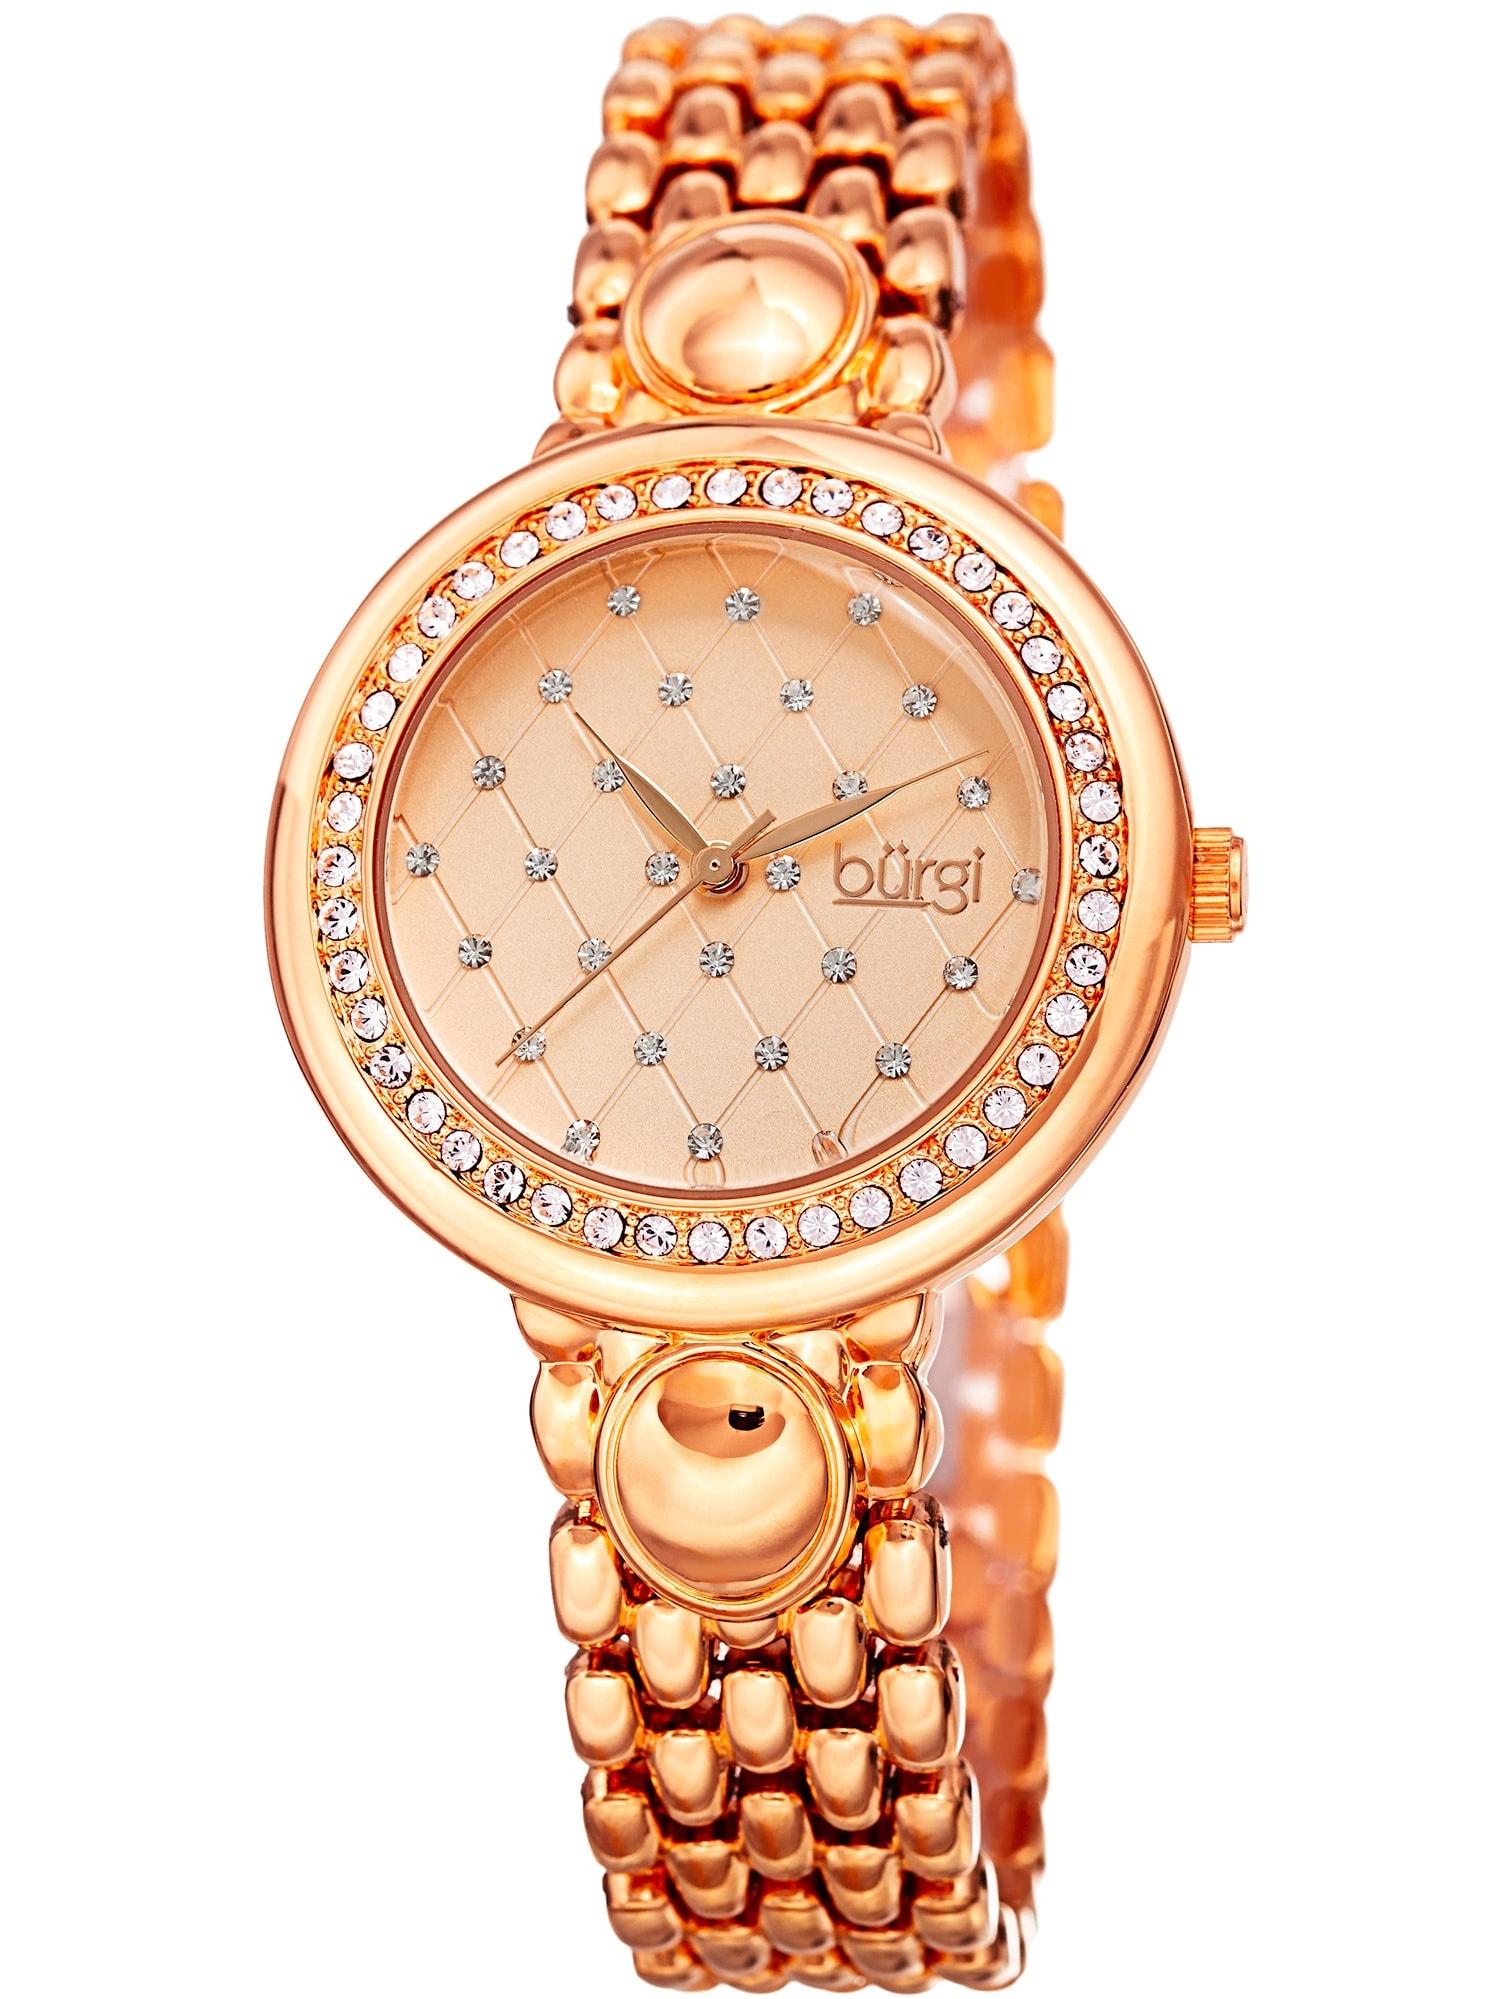 Women's Swarovski Crystal Diamond Patterned Elegant Rose-Tone Bracelet Watch with FREE Bangle